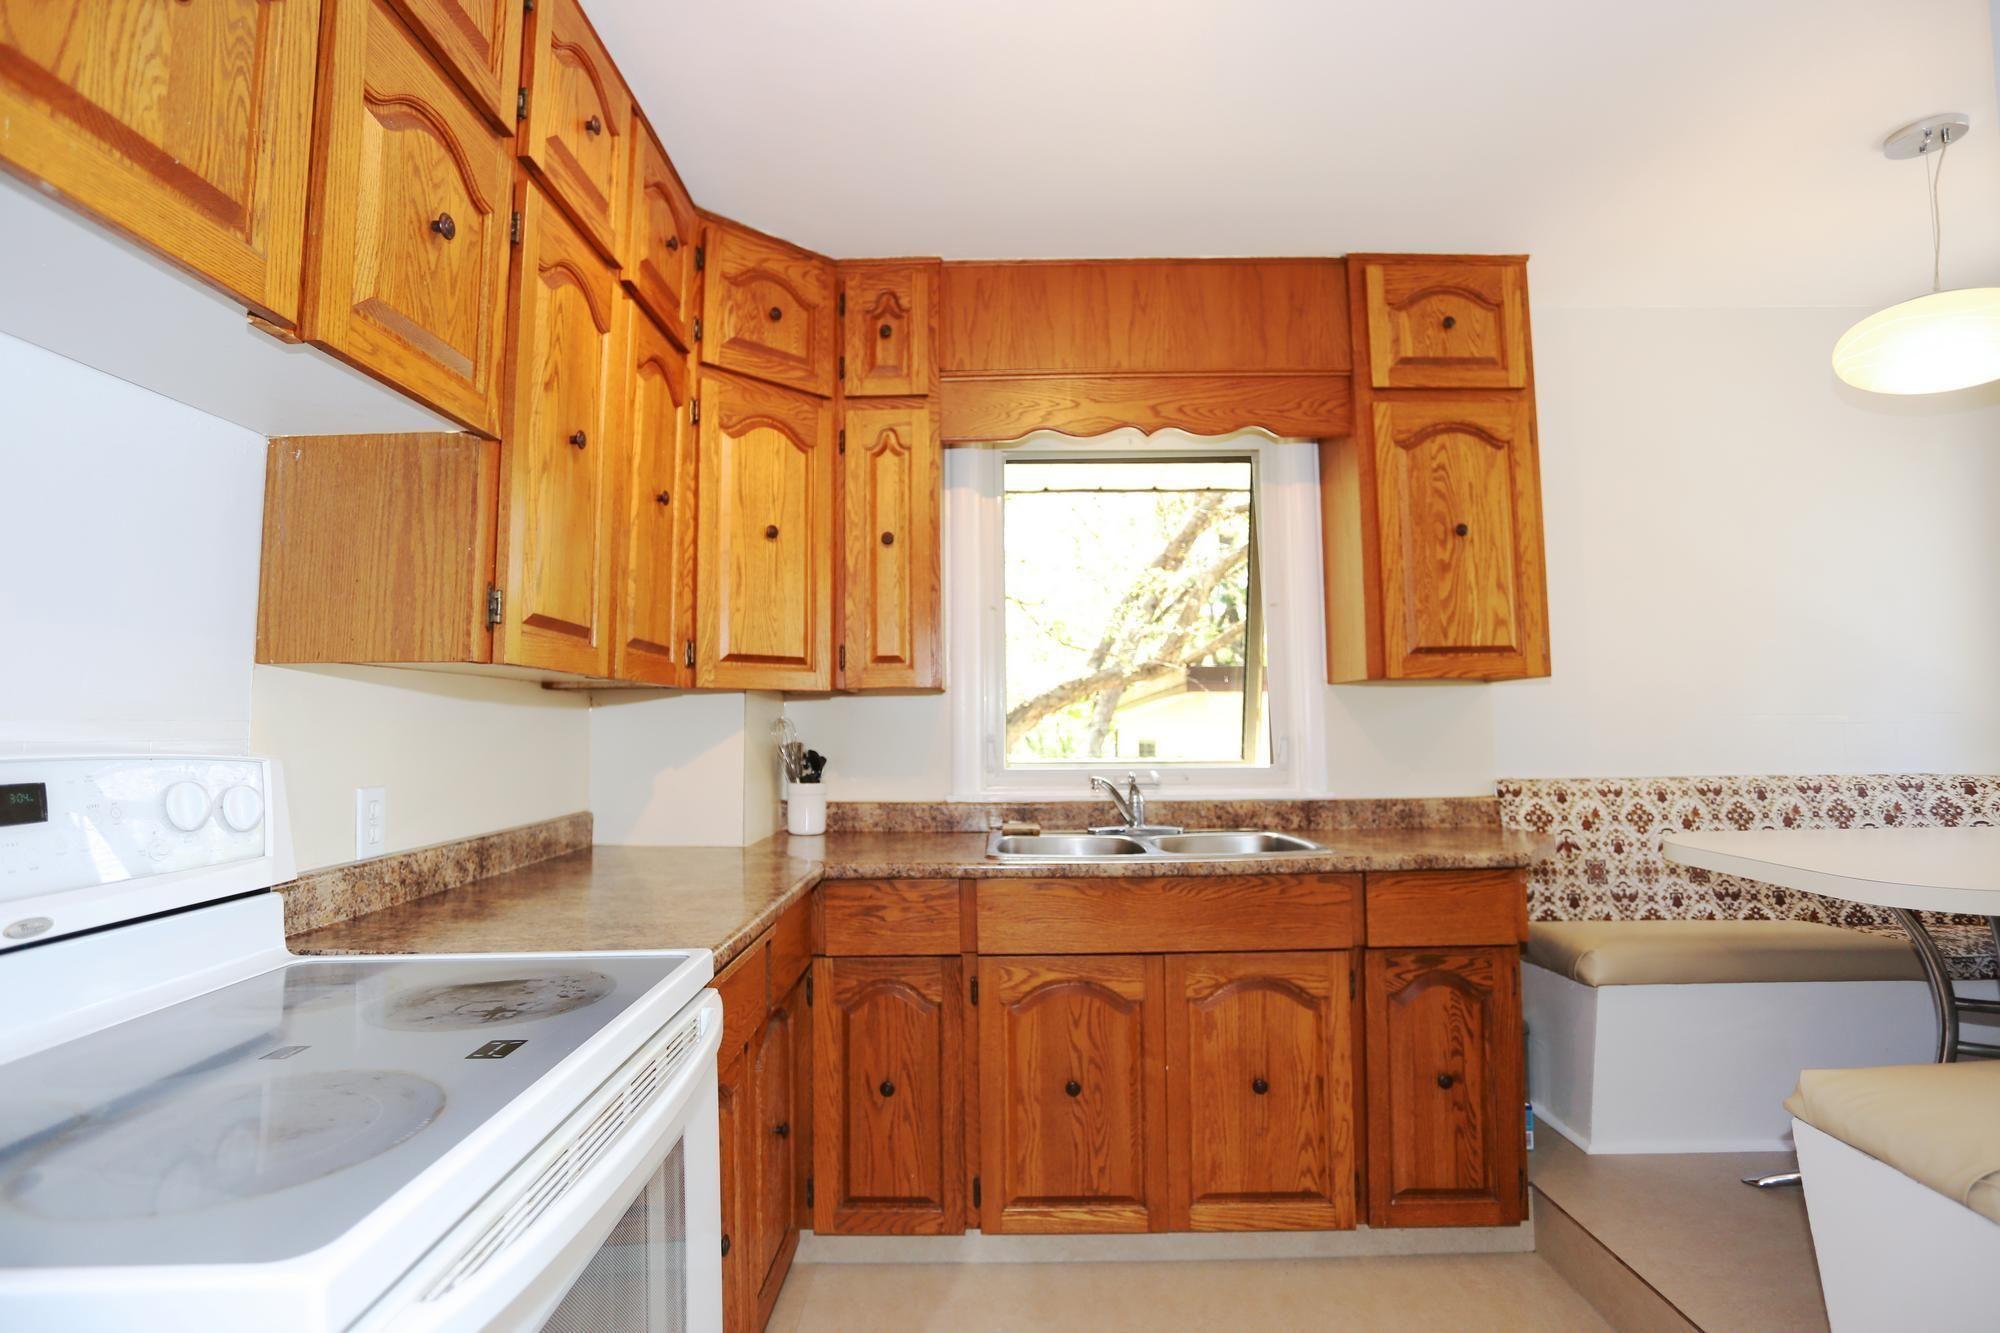 Photo 9: Photos: 290 McLeod Avenue in Winnipeg: North Kildonan Single Family Detached for sale (3F)  : MLS®# 1814938